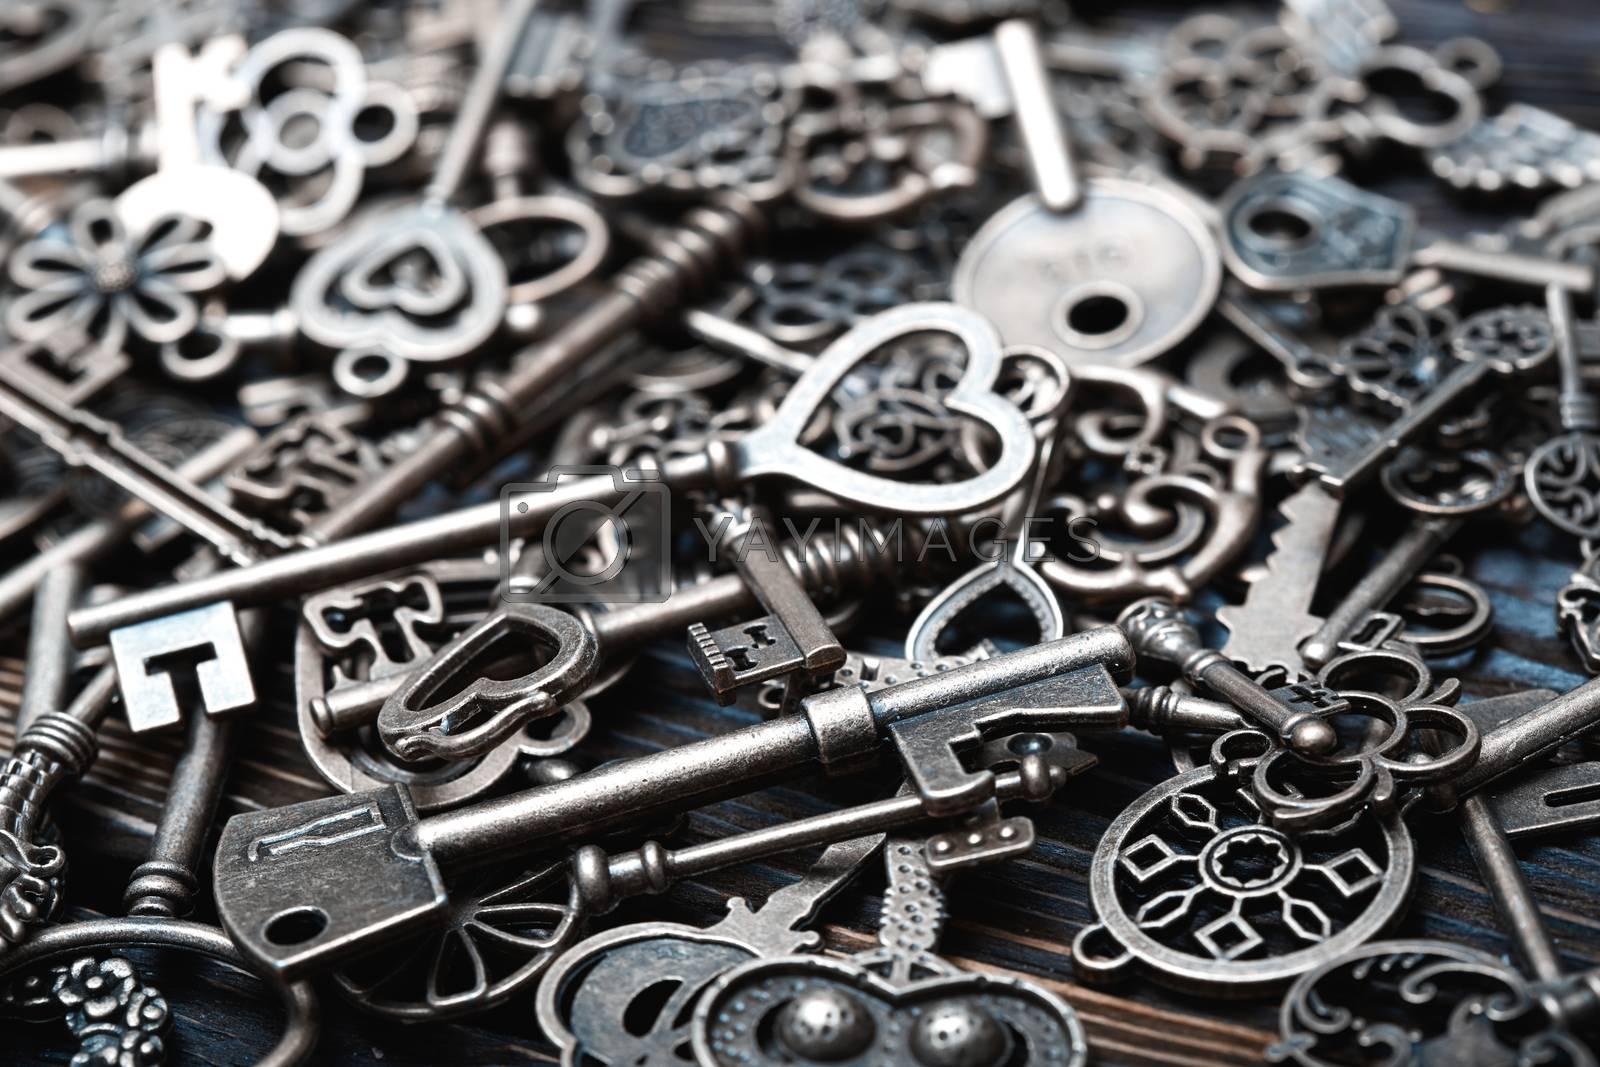 Full frame photo of the various antique keys by Novic